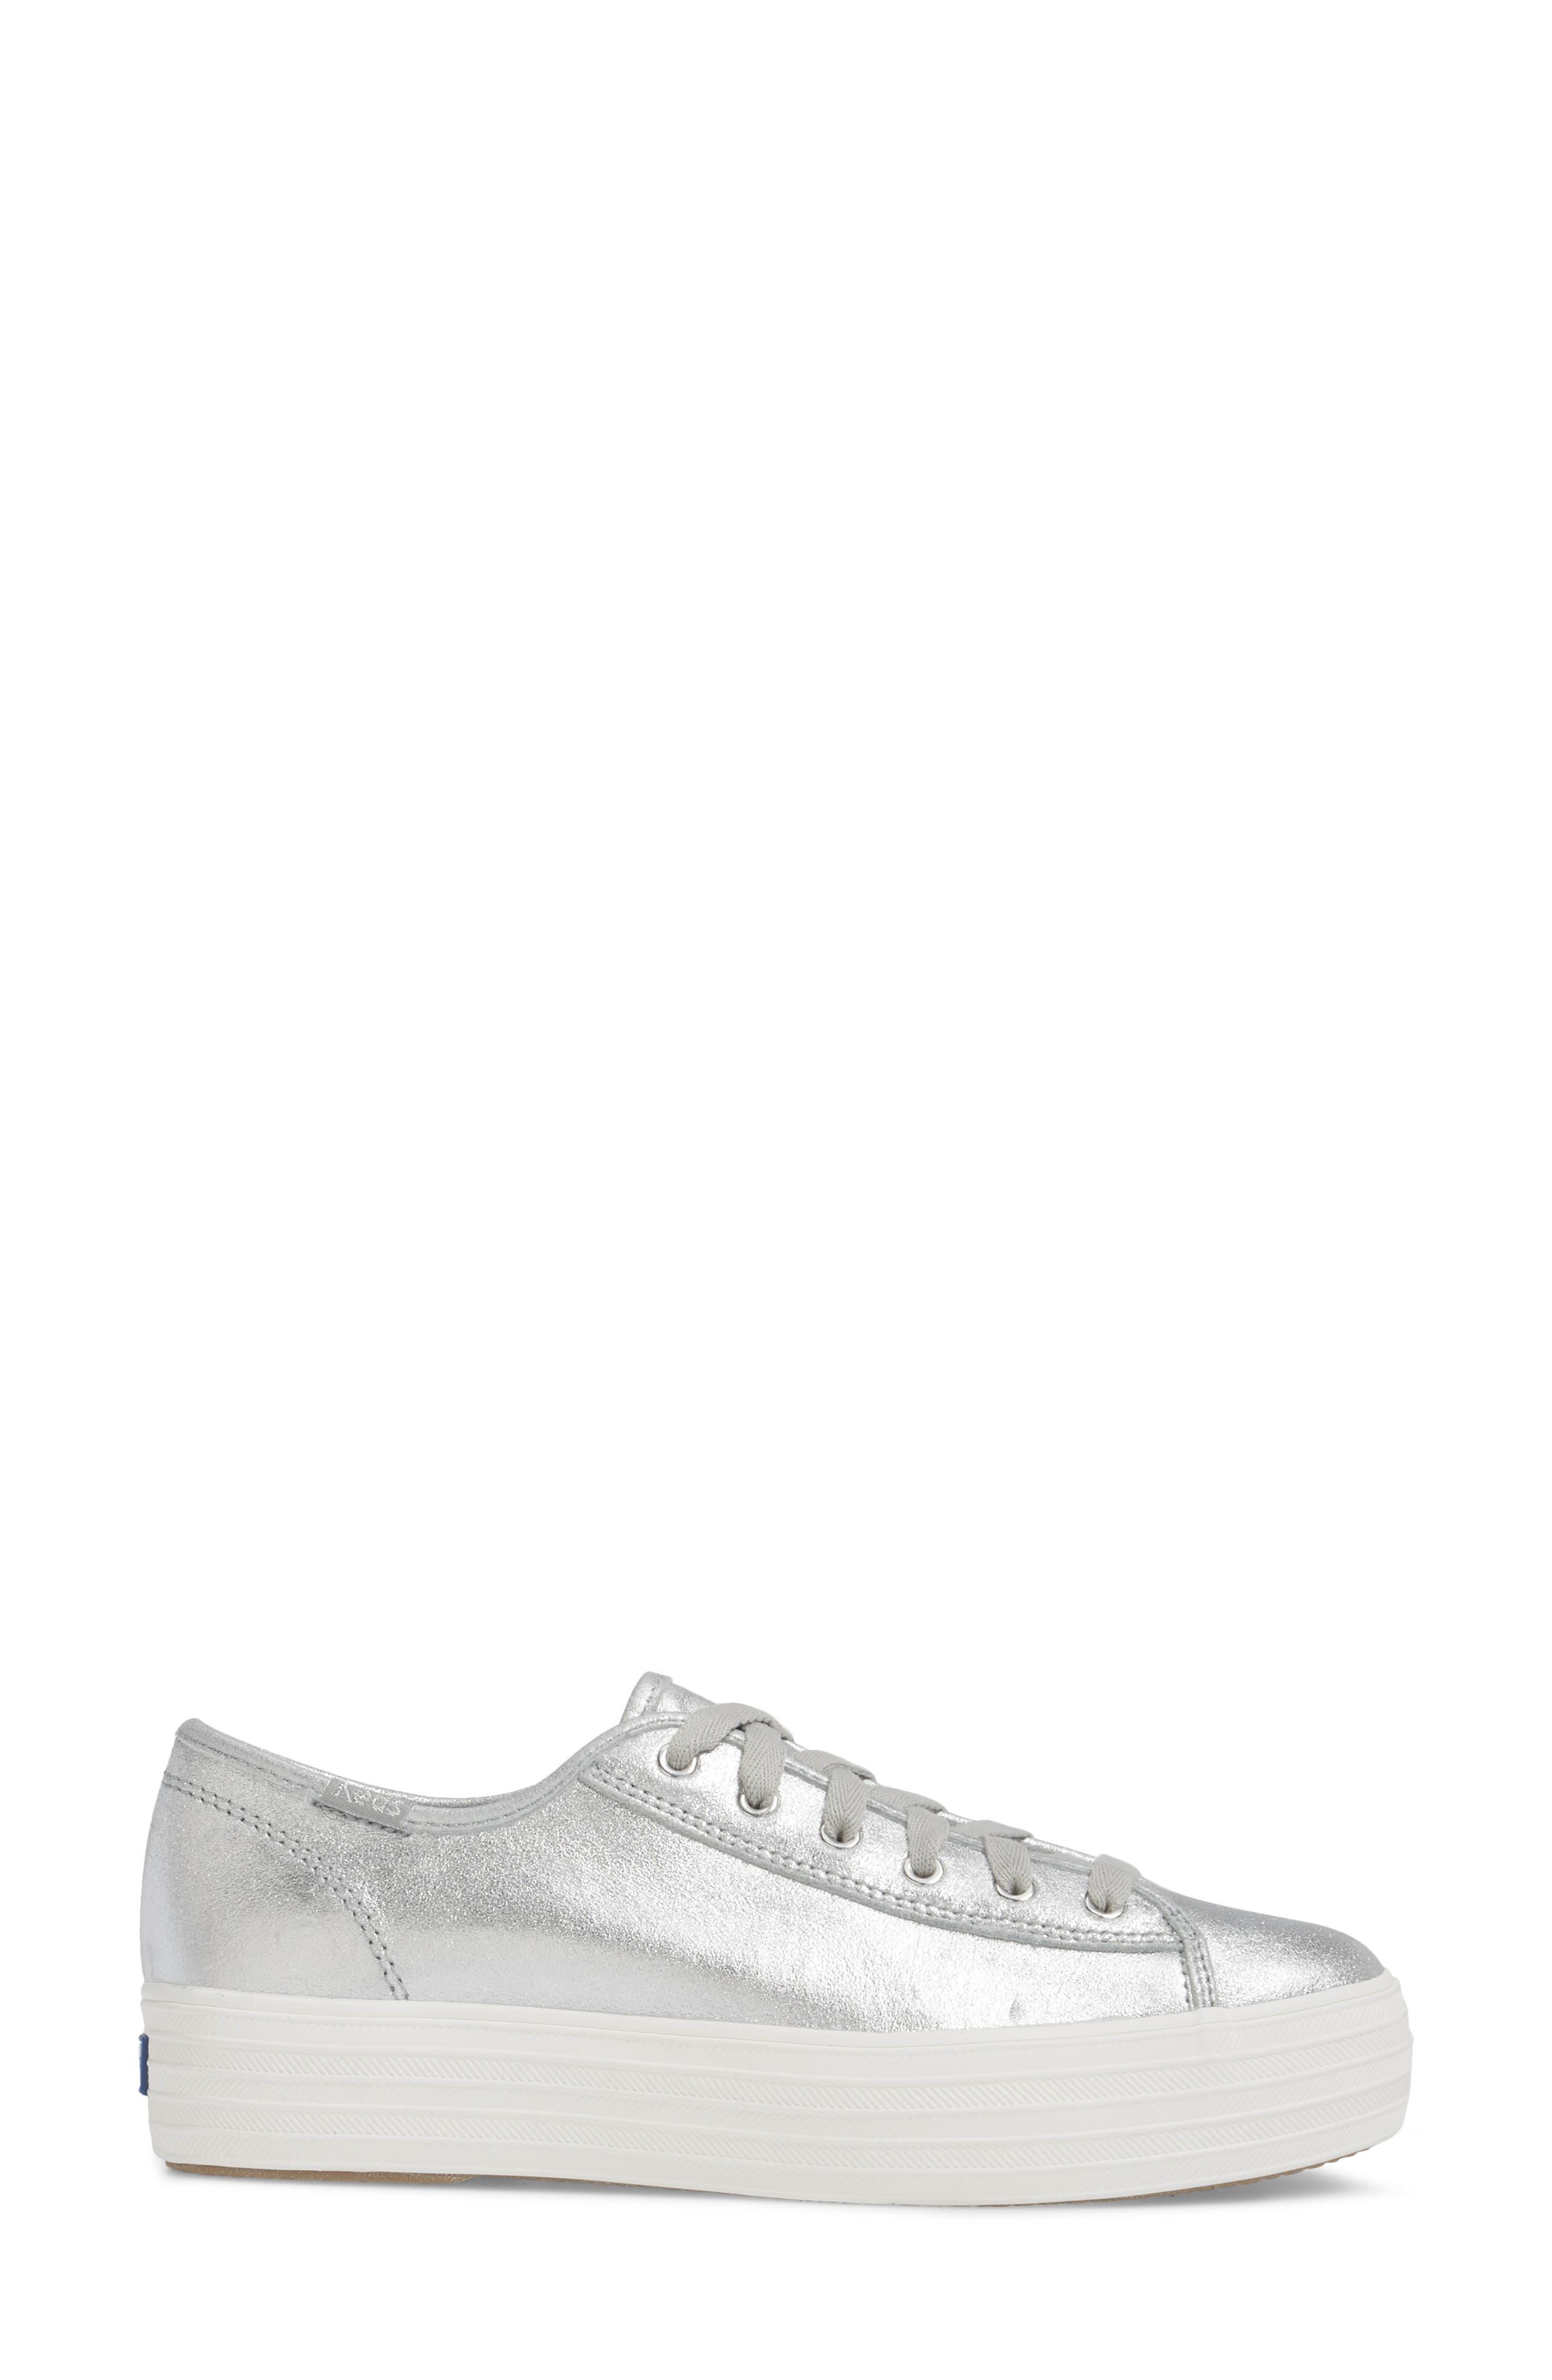 Triple Kick Platform Sneaker,                             Alternate thumbnail 3, color,                             Silver